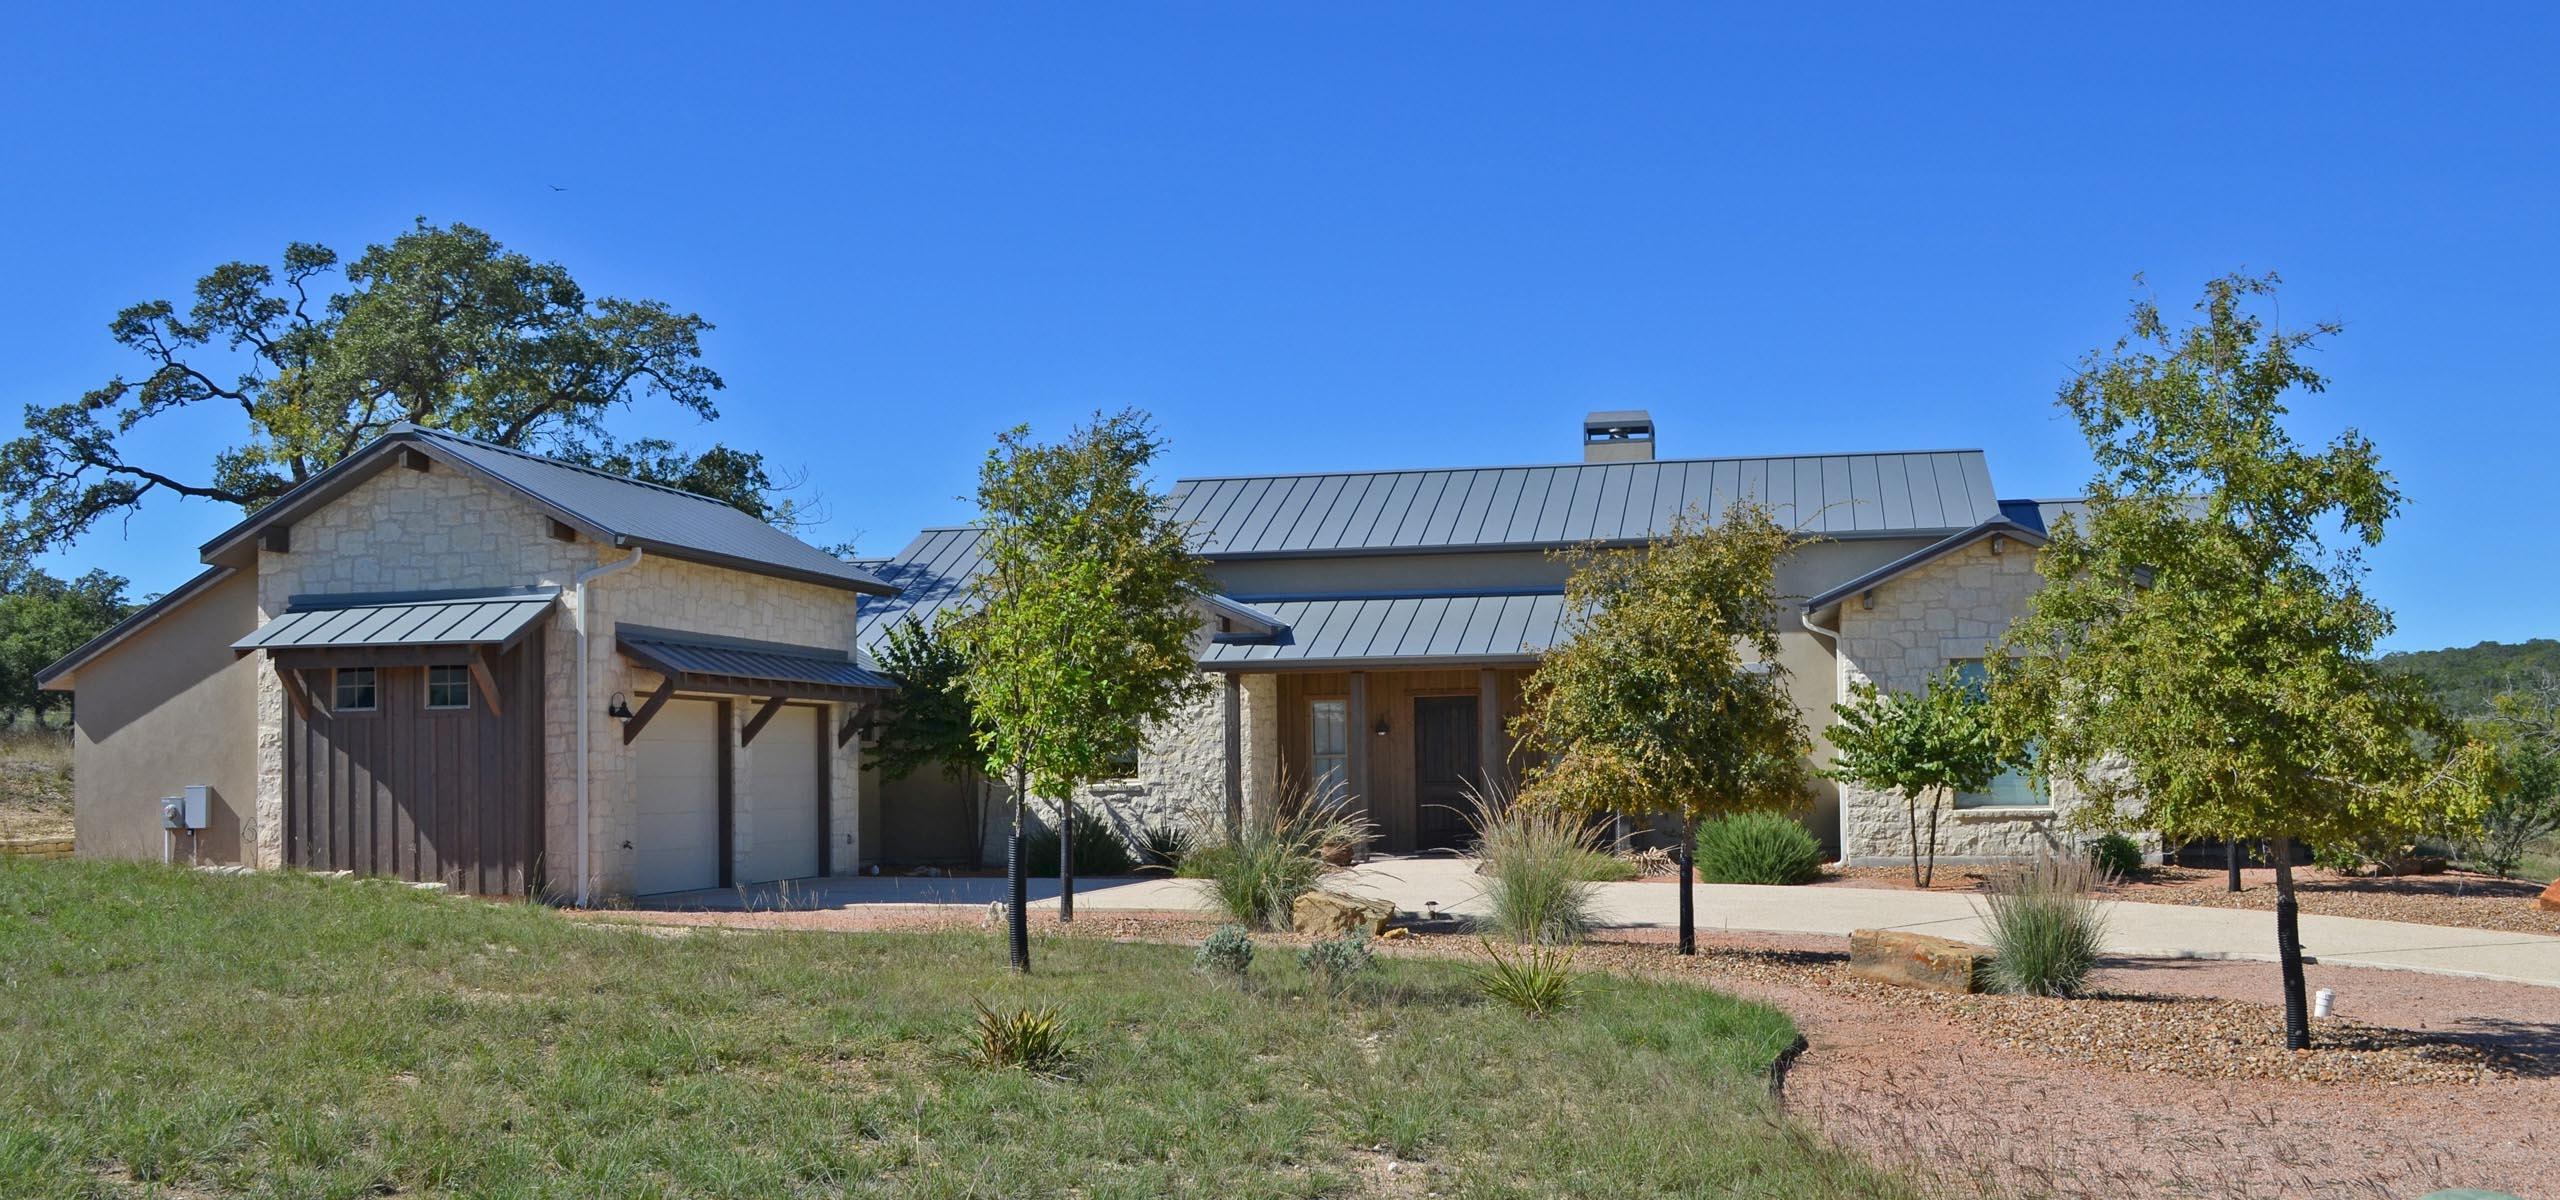 Shadden house texas home plans for South texas house plans